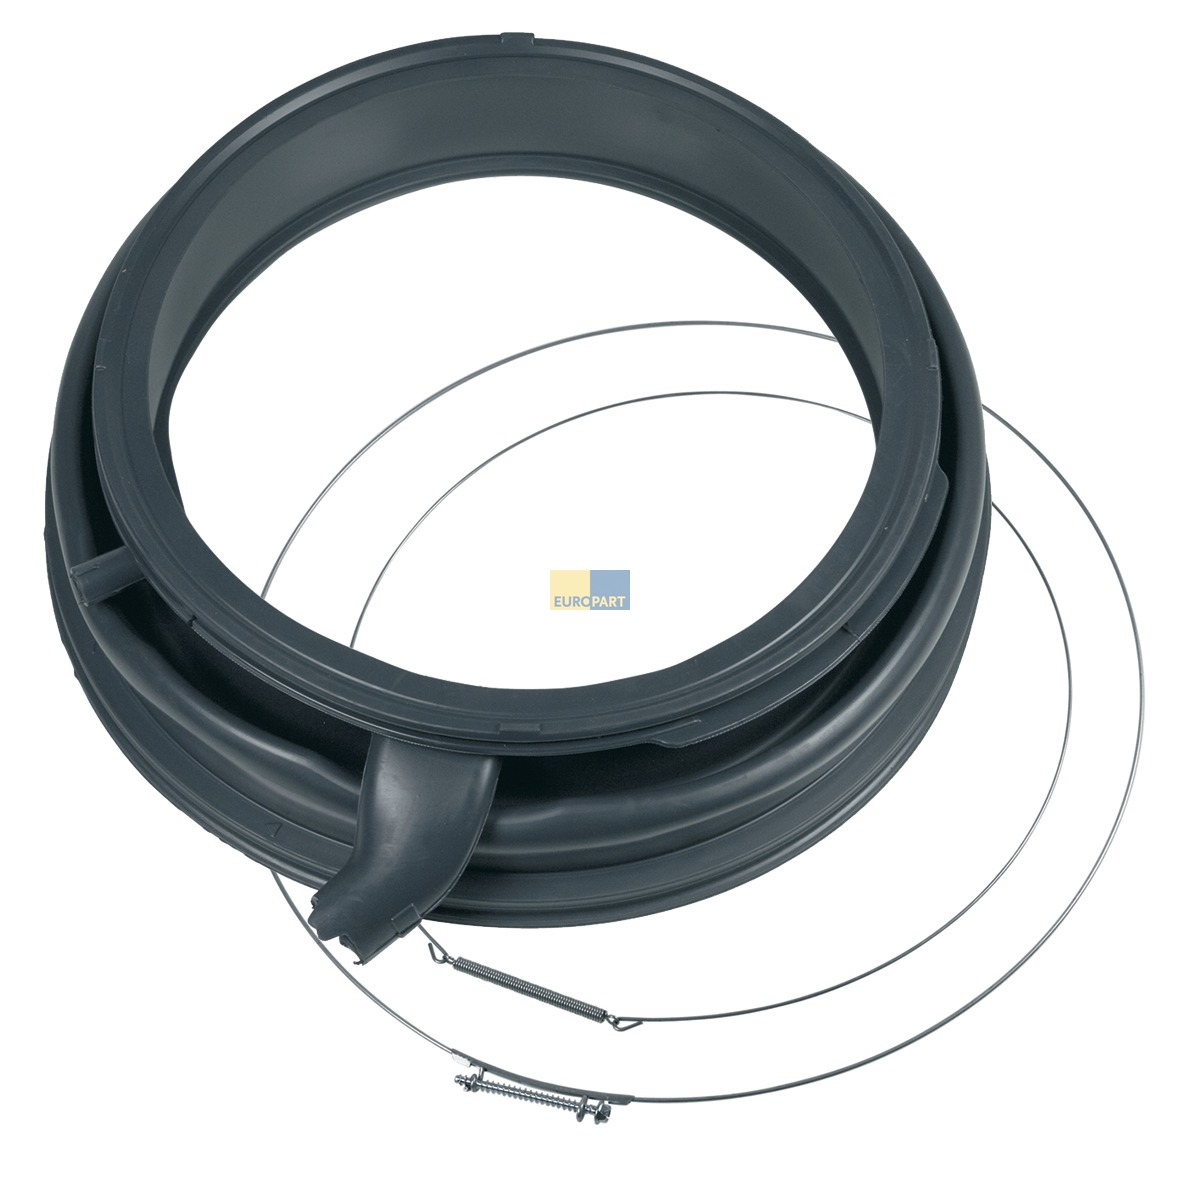 Turmanschette Turdichtung Bosch 00772662 Original Abea Hausgerate